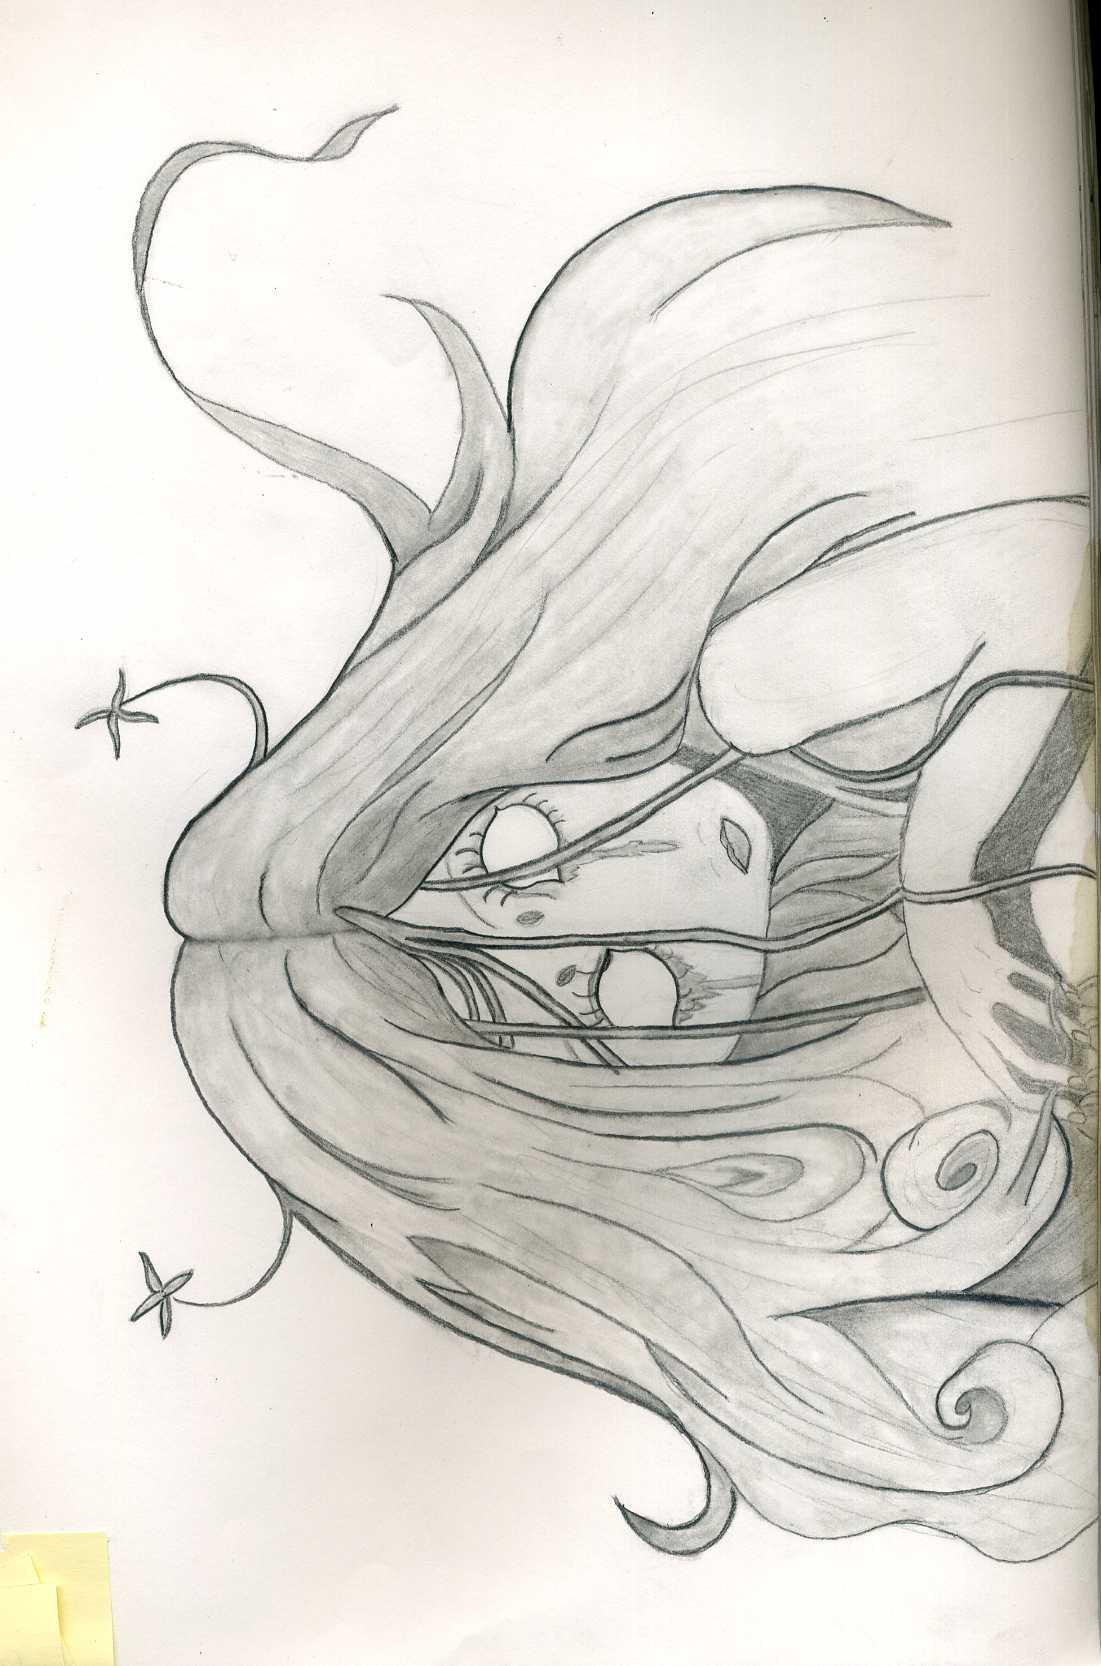 1101x1666 Scary Girl, Long Hair, Creepy, No Eyes, Black And White, Sketch